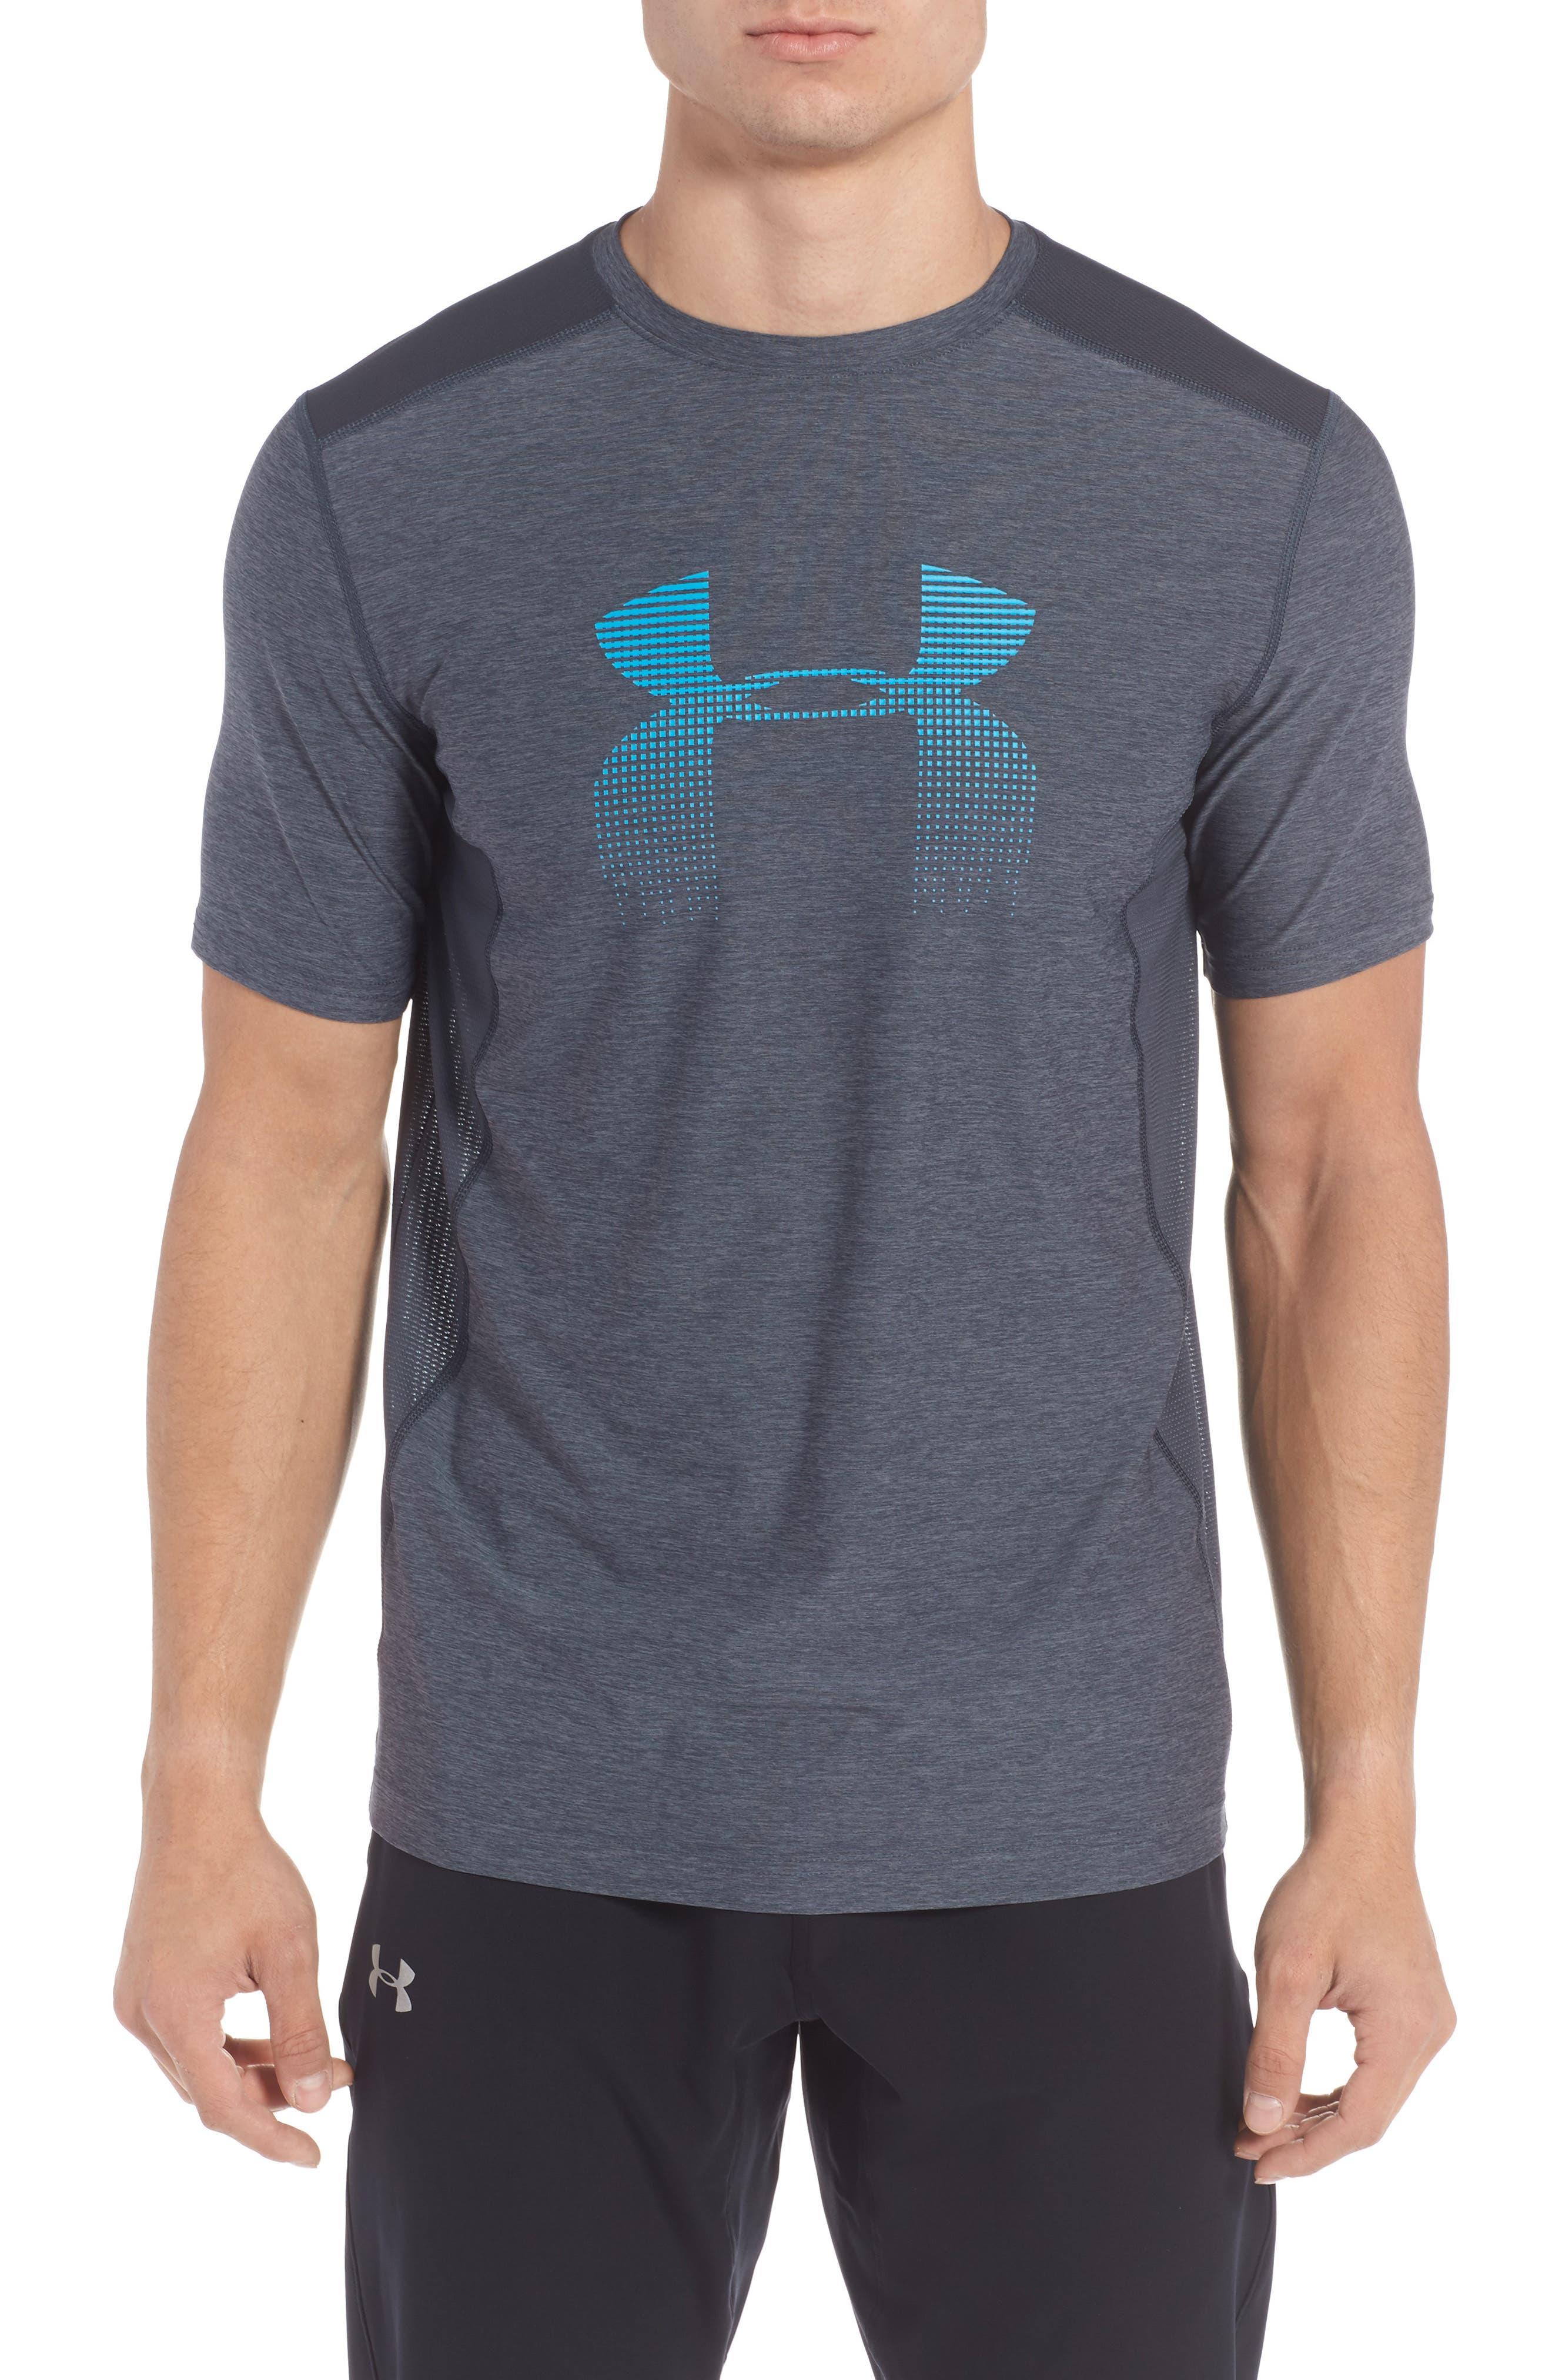 Raid Graphic T-Shirt,                             Main thumbnail 1, color,                             Stealth Grey / / Blue Shift